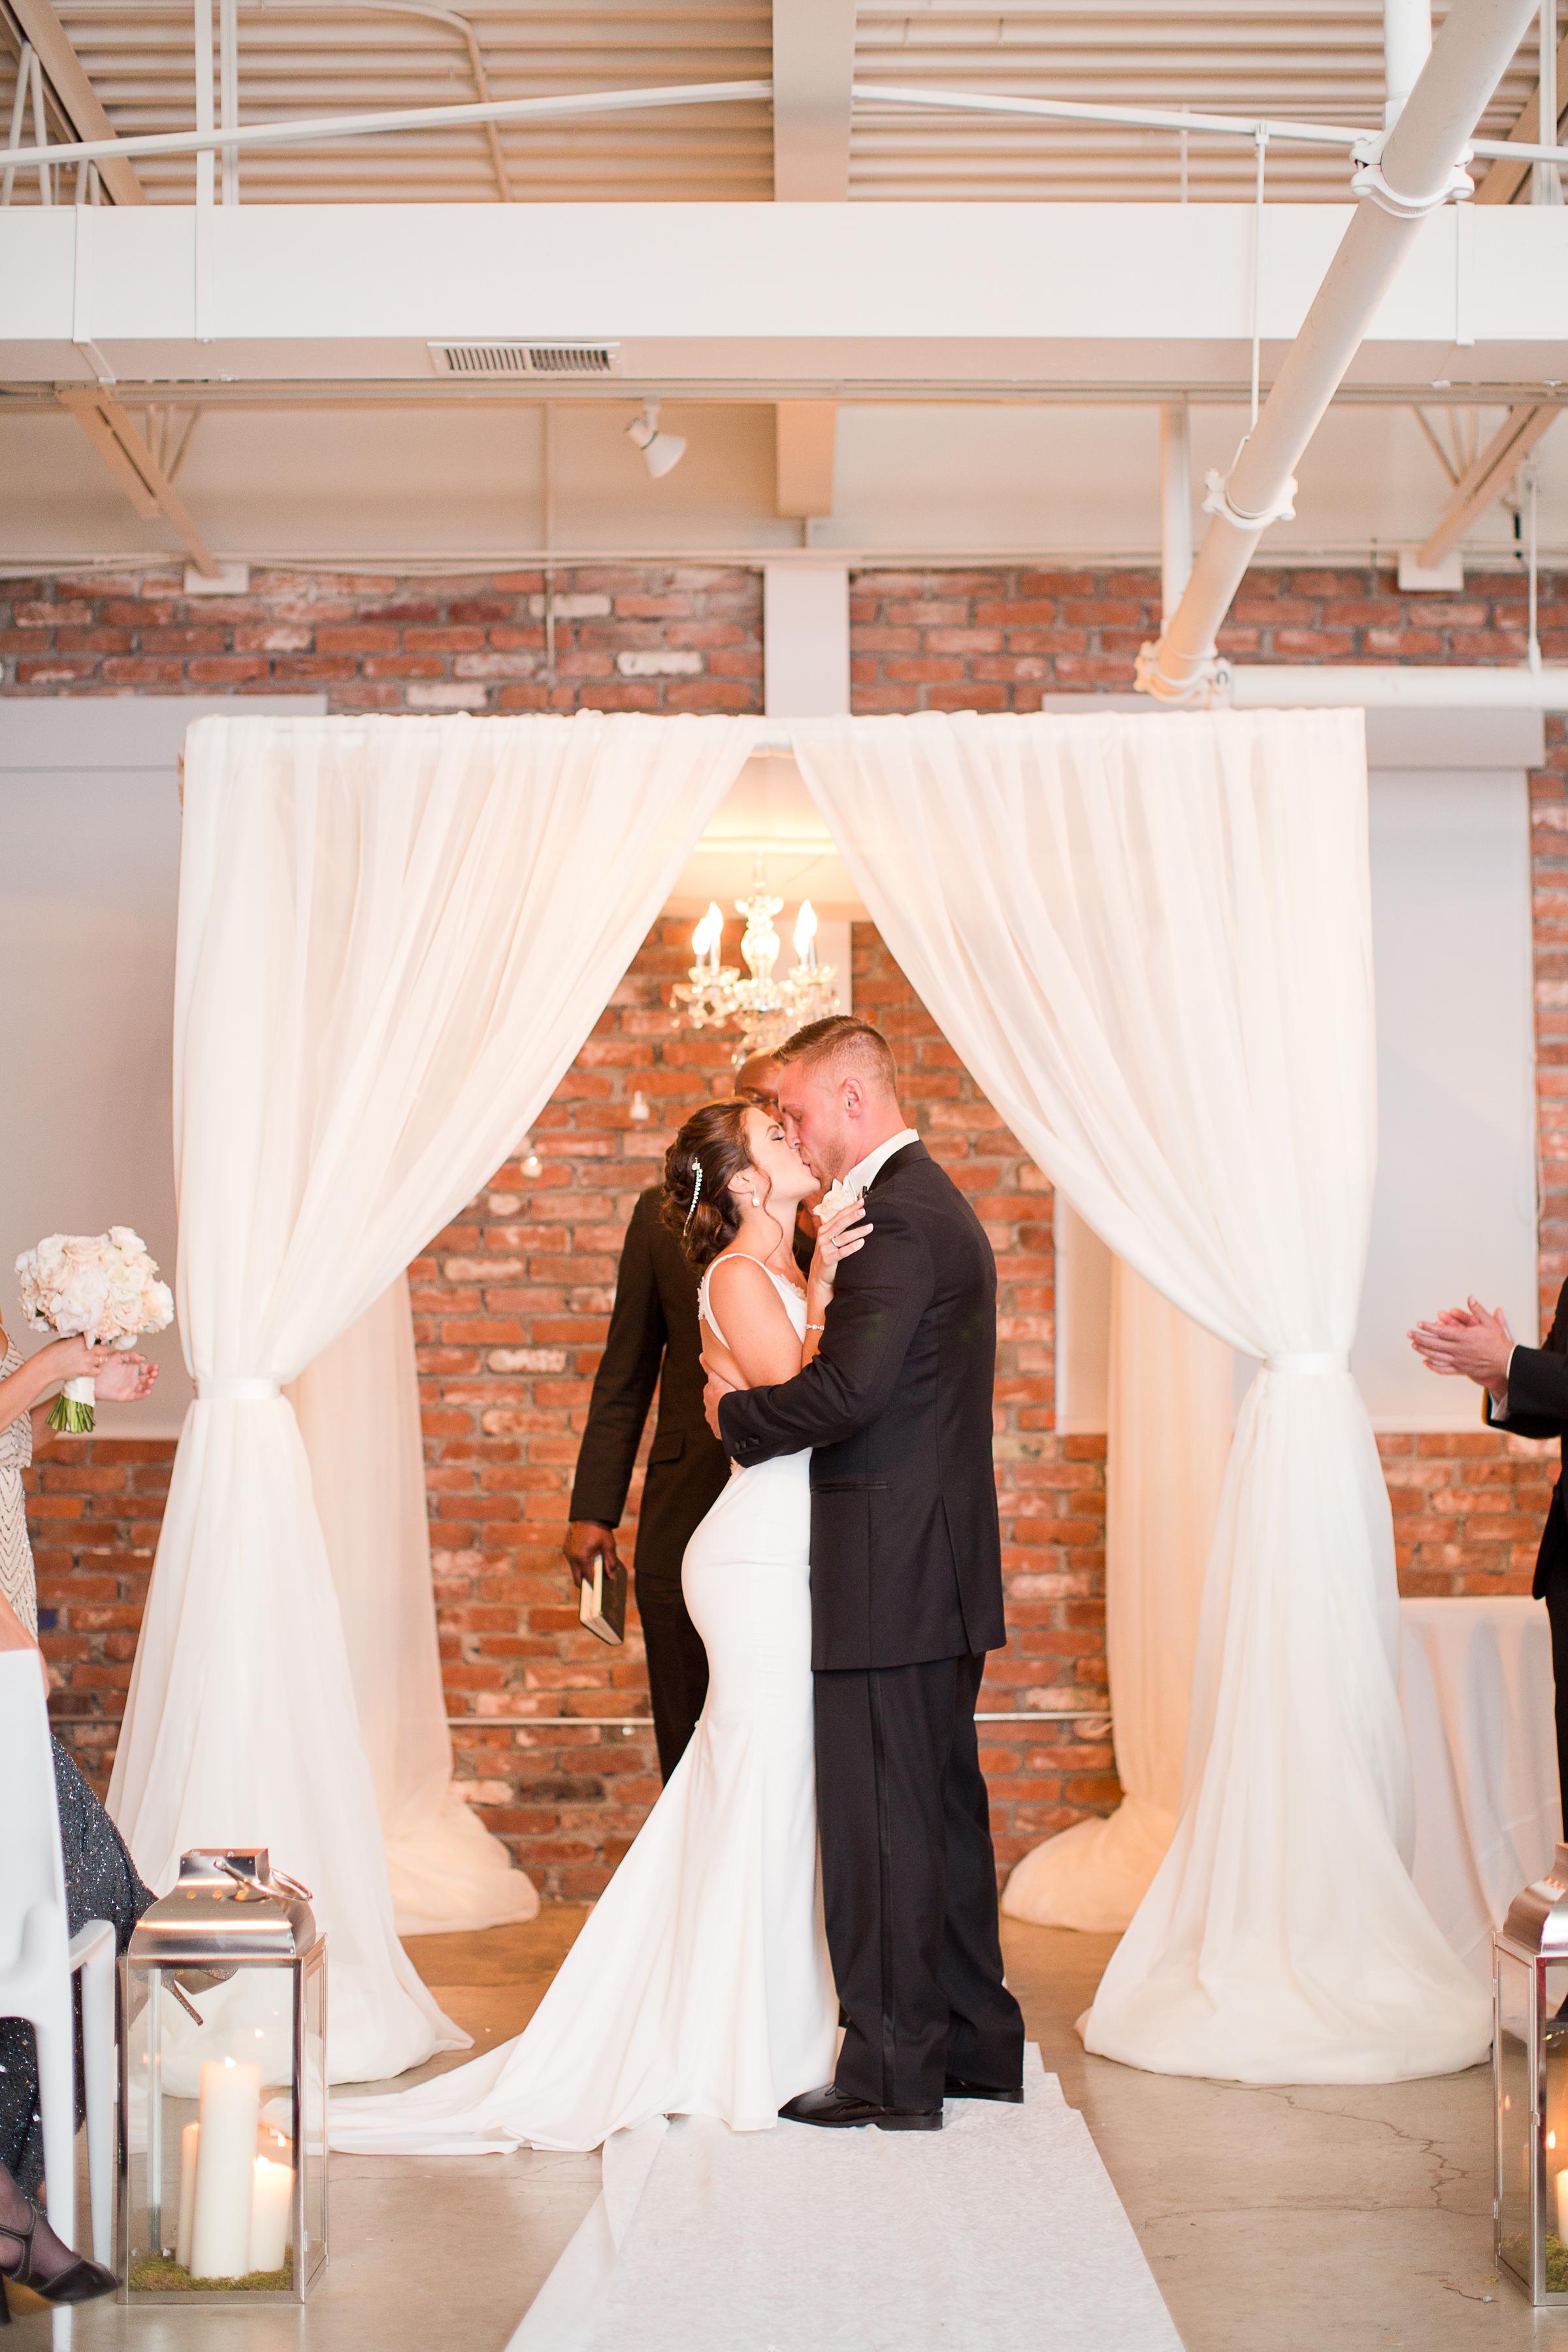 Melissa Kruse Photography - Genna + Anthony The Loading Dock Stamford CT Wedding-630.jpg